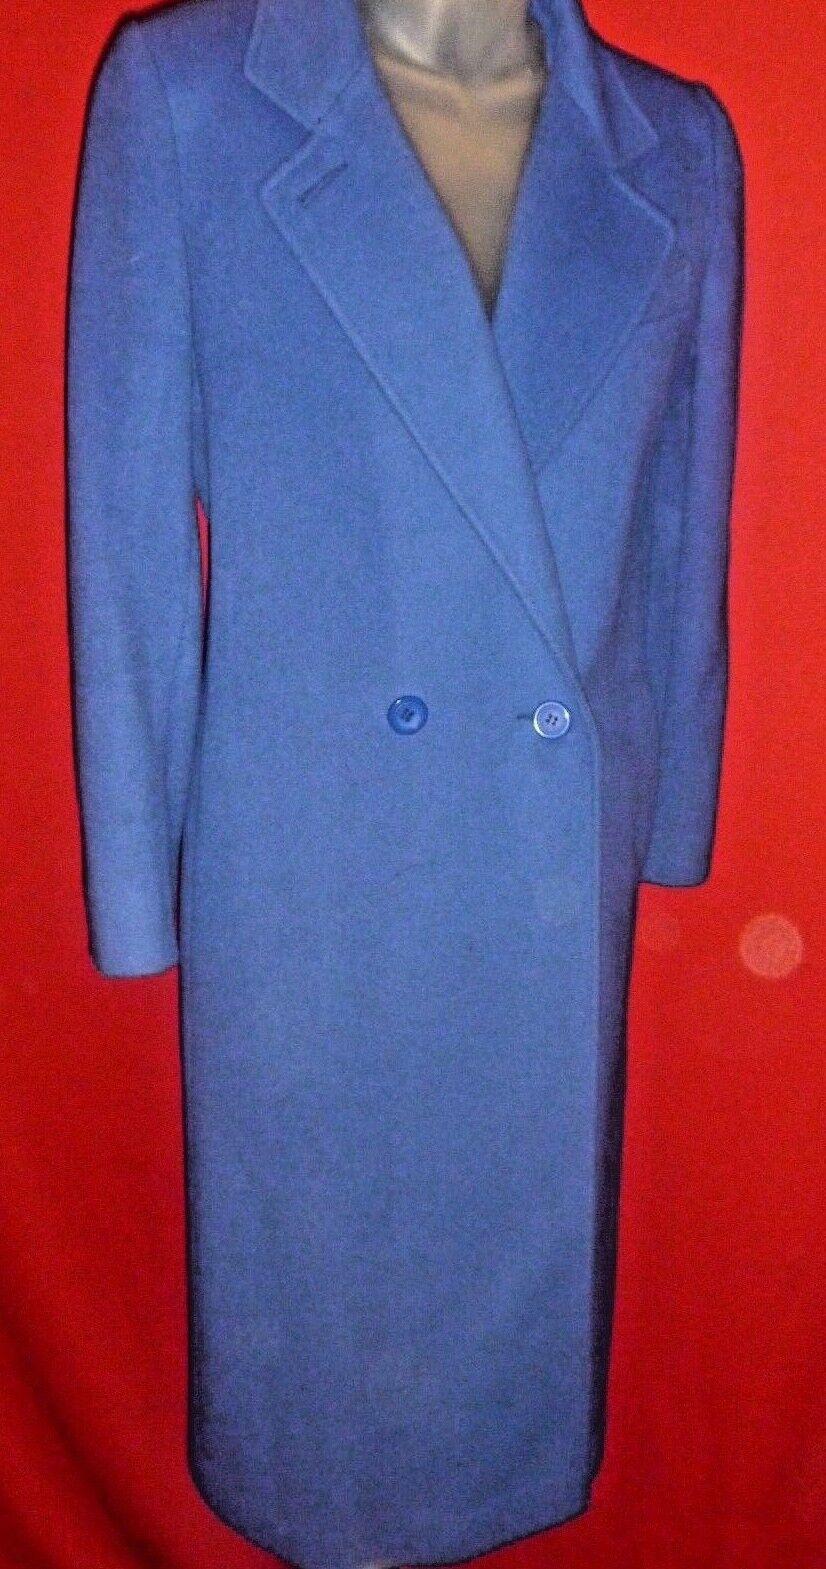 VTG VTG VTG PIN POINT FASHIONS Royal bluee 100% Wool Stroller Coat Sz Large 565de4